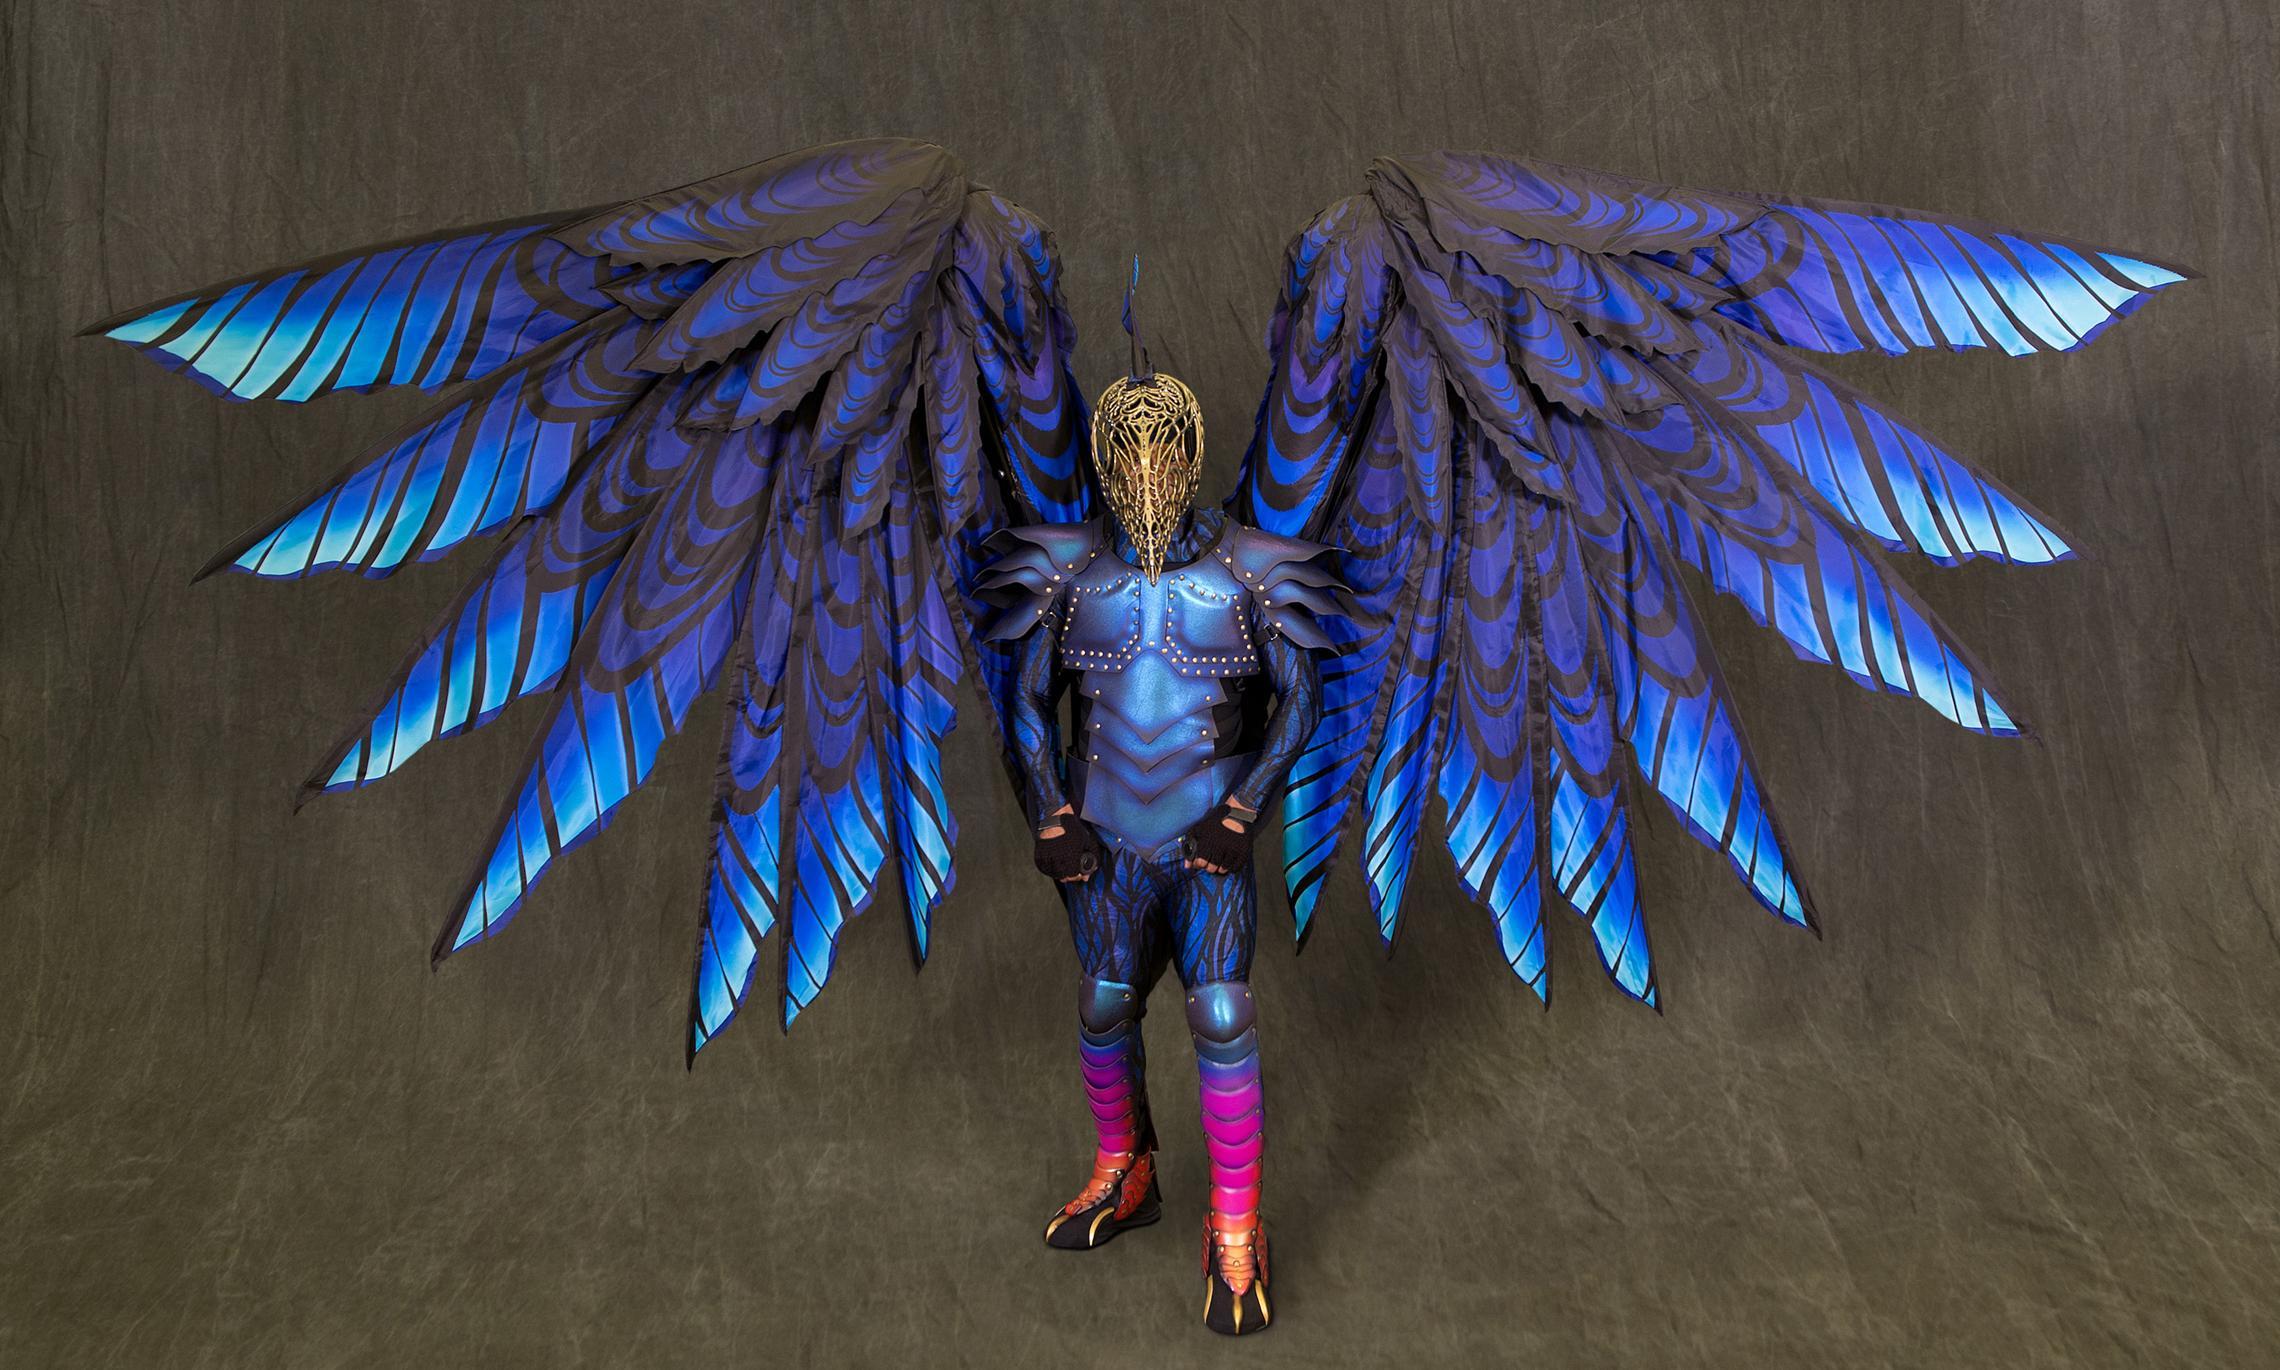 Disney Festival of Fantasy Parade Costumes - Raven